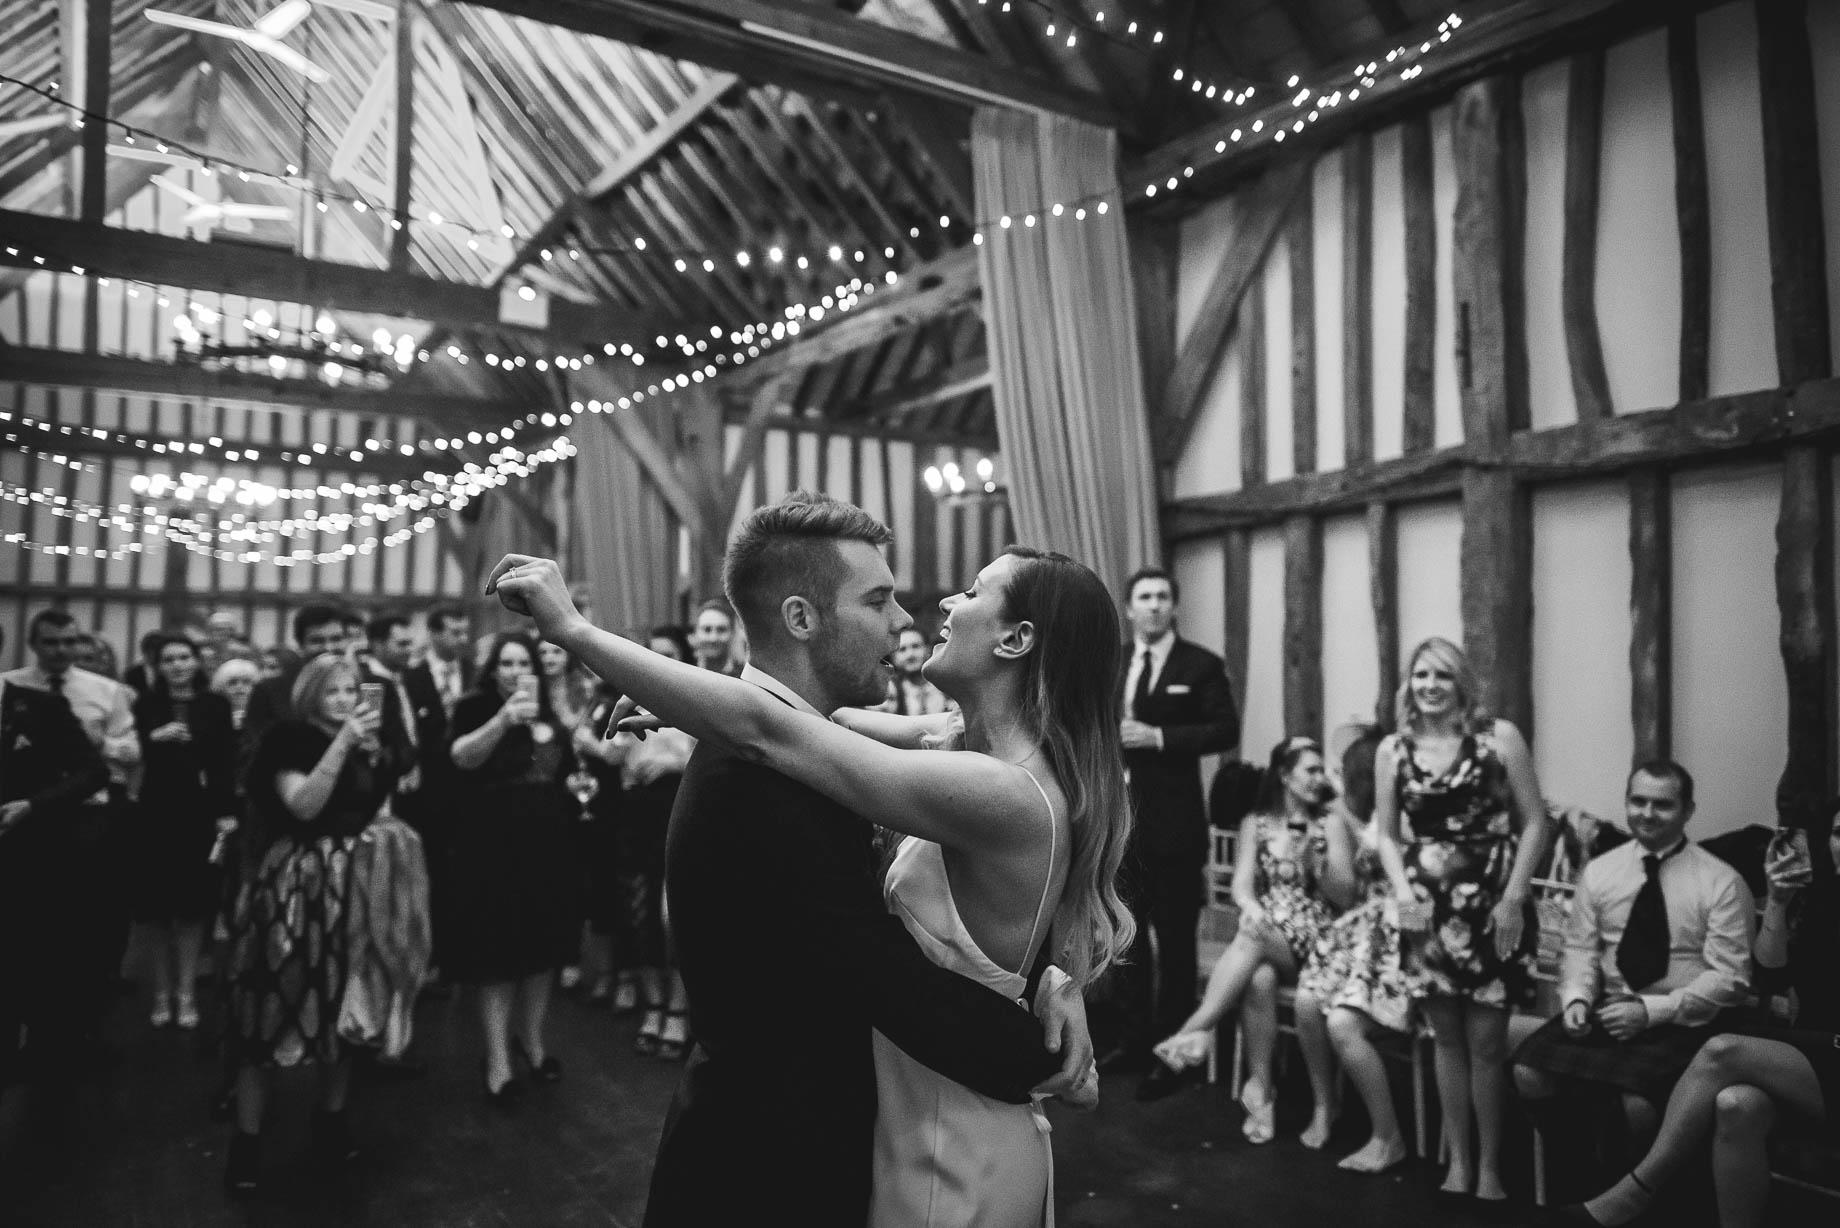 the olde bell hurley wedding disco